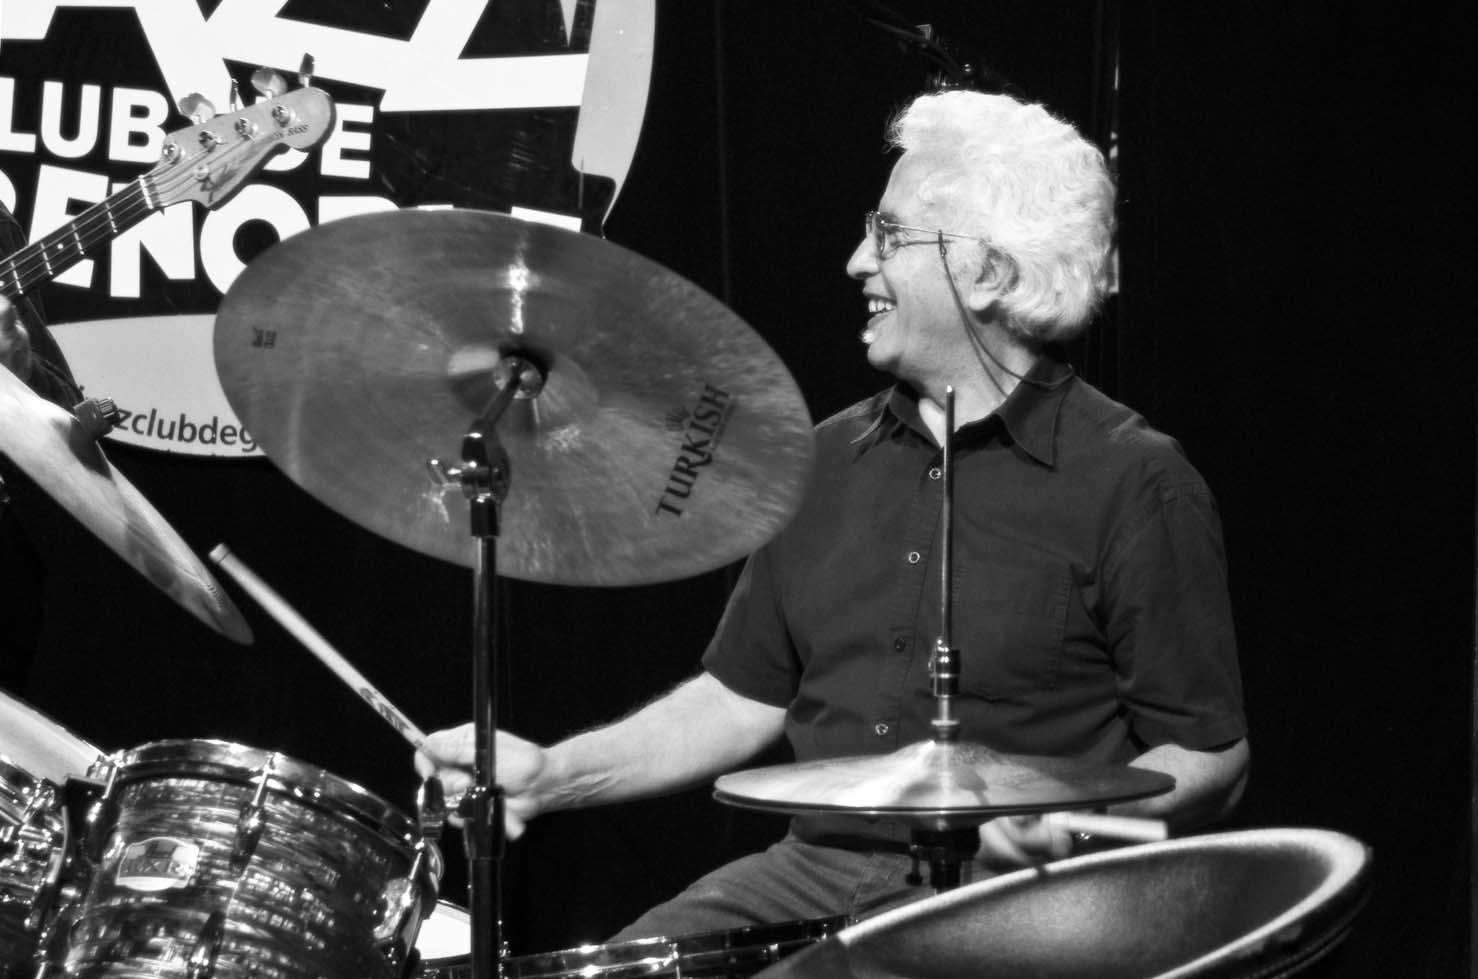 Salvatore Origlio : « Le jazz s'adresse à tout le monde »